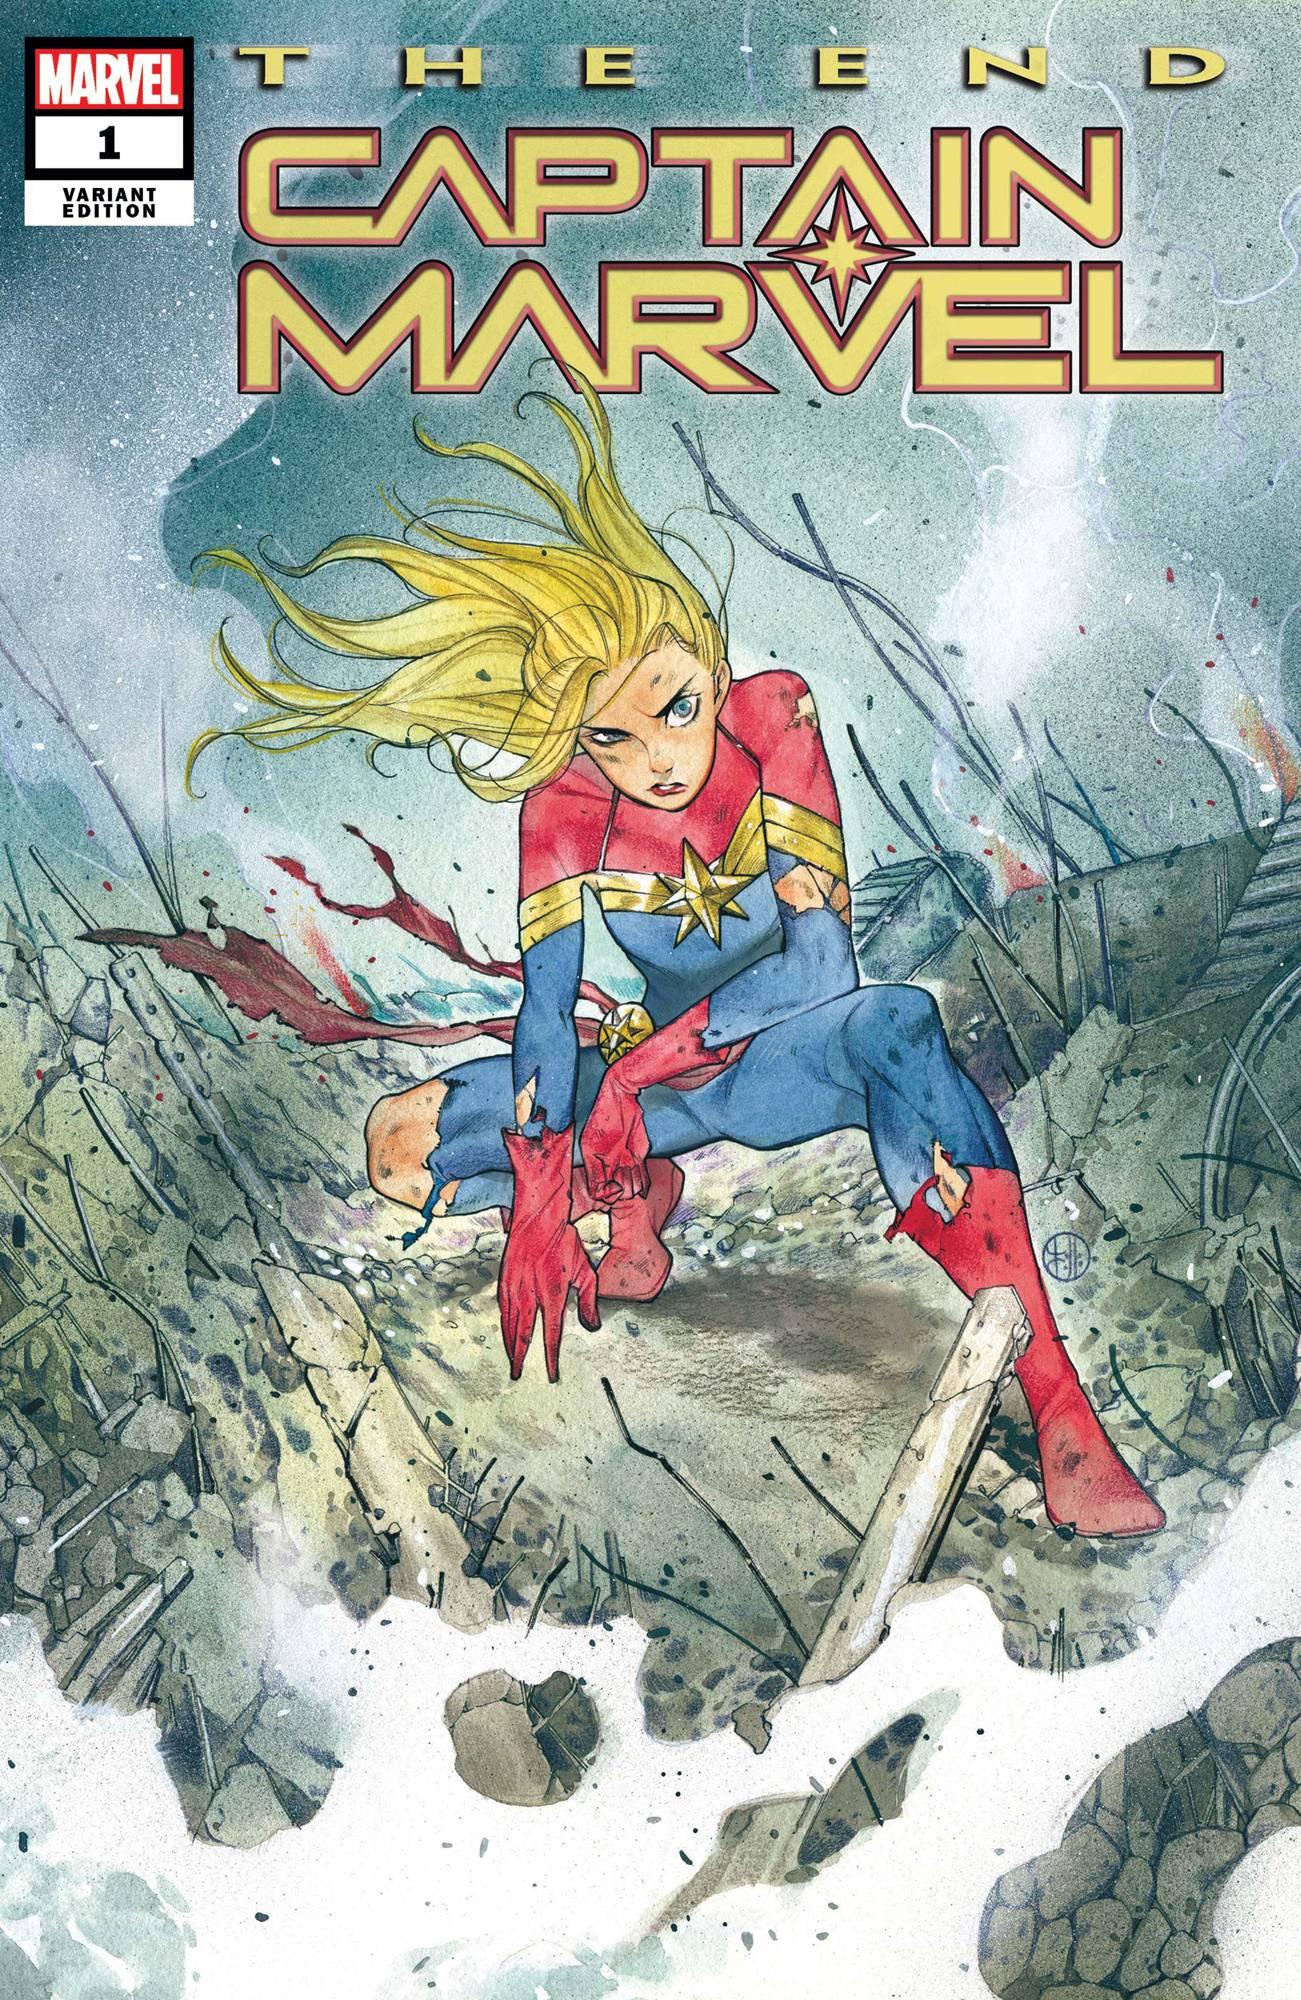 Captain Marvel: The End #1 (2020)